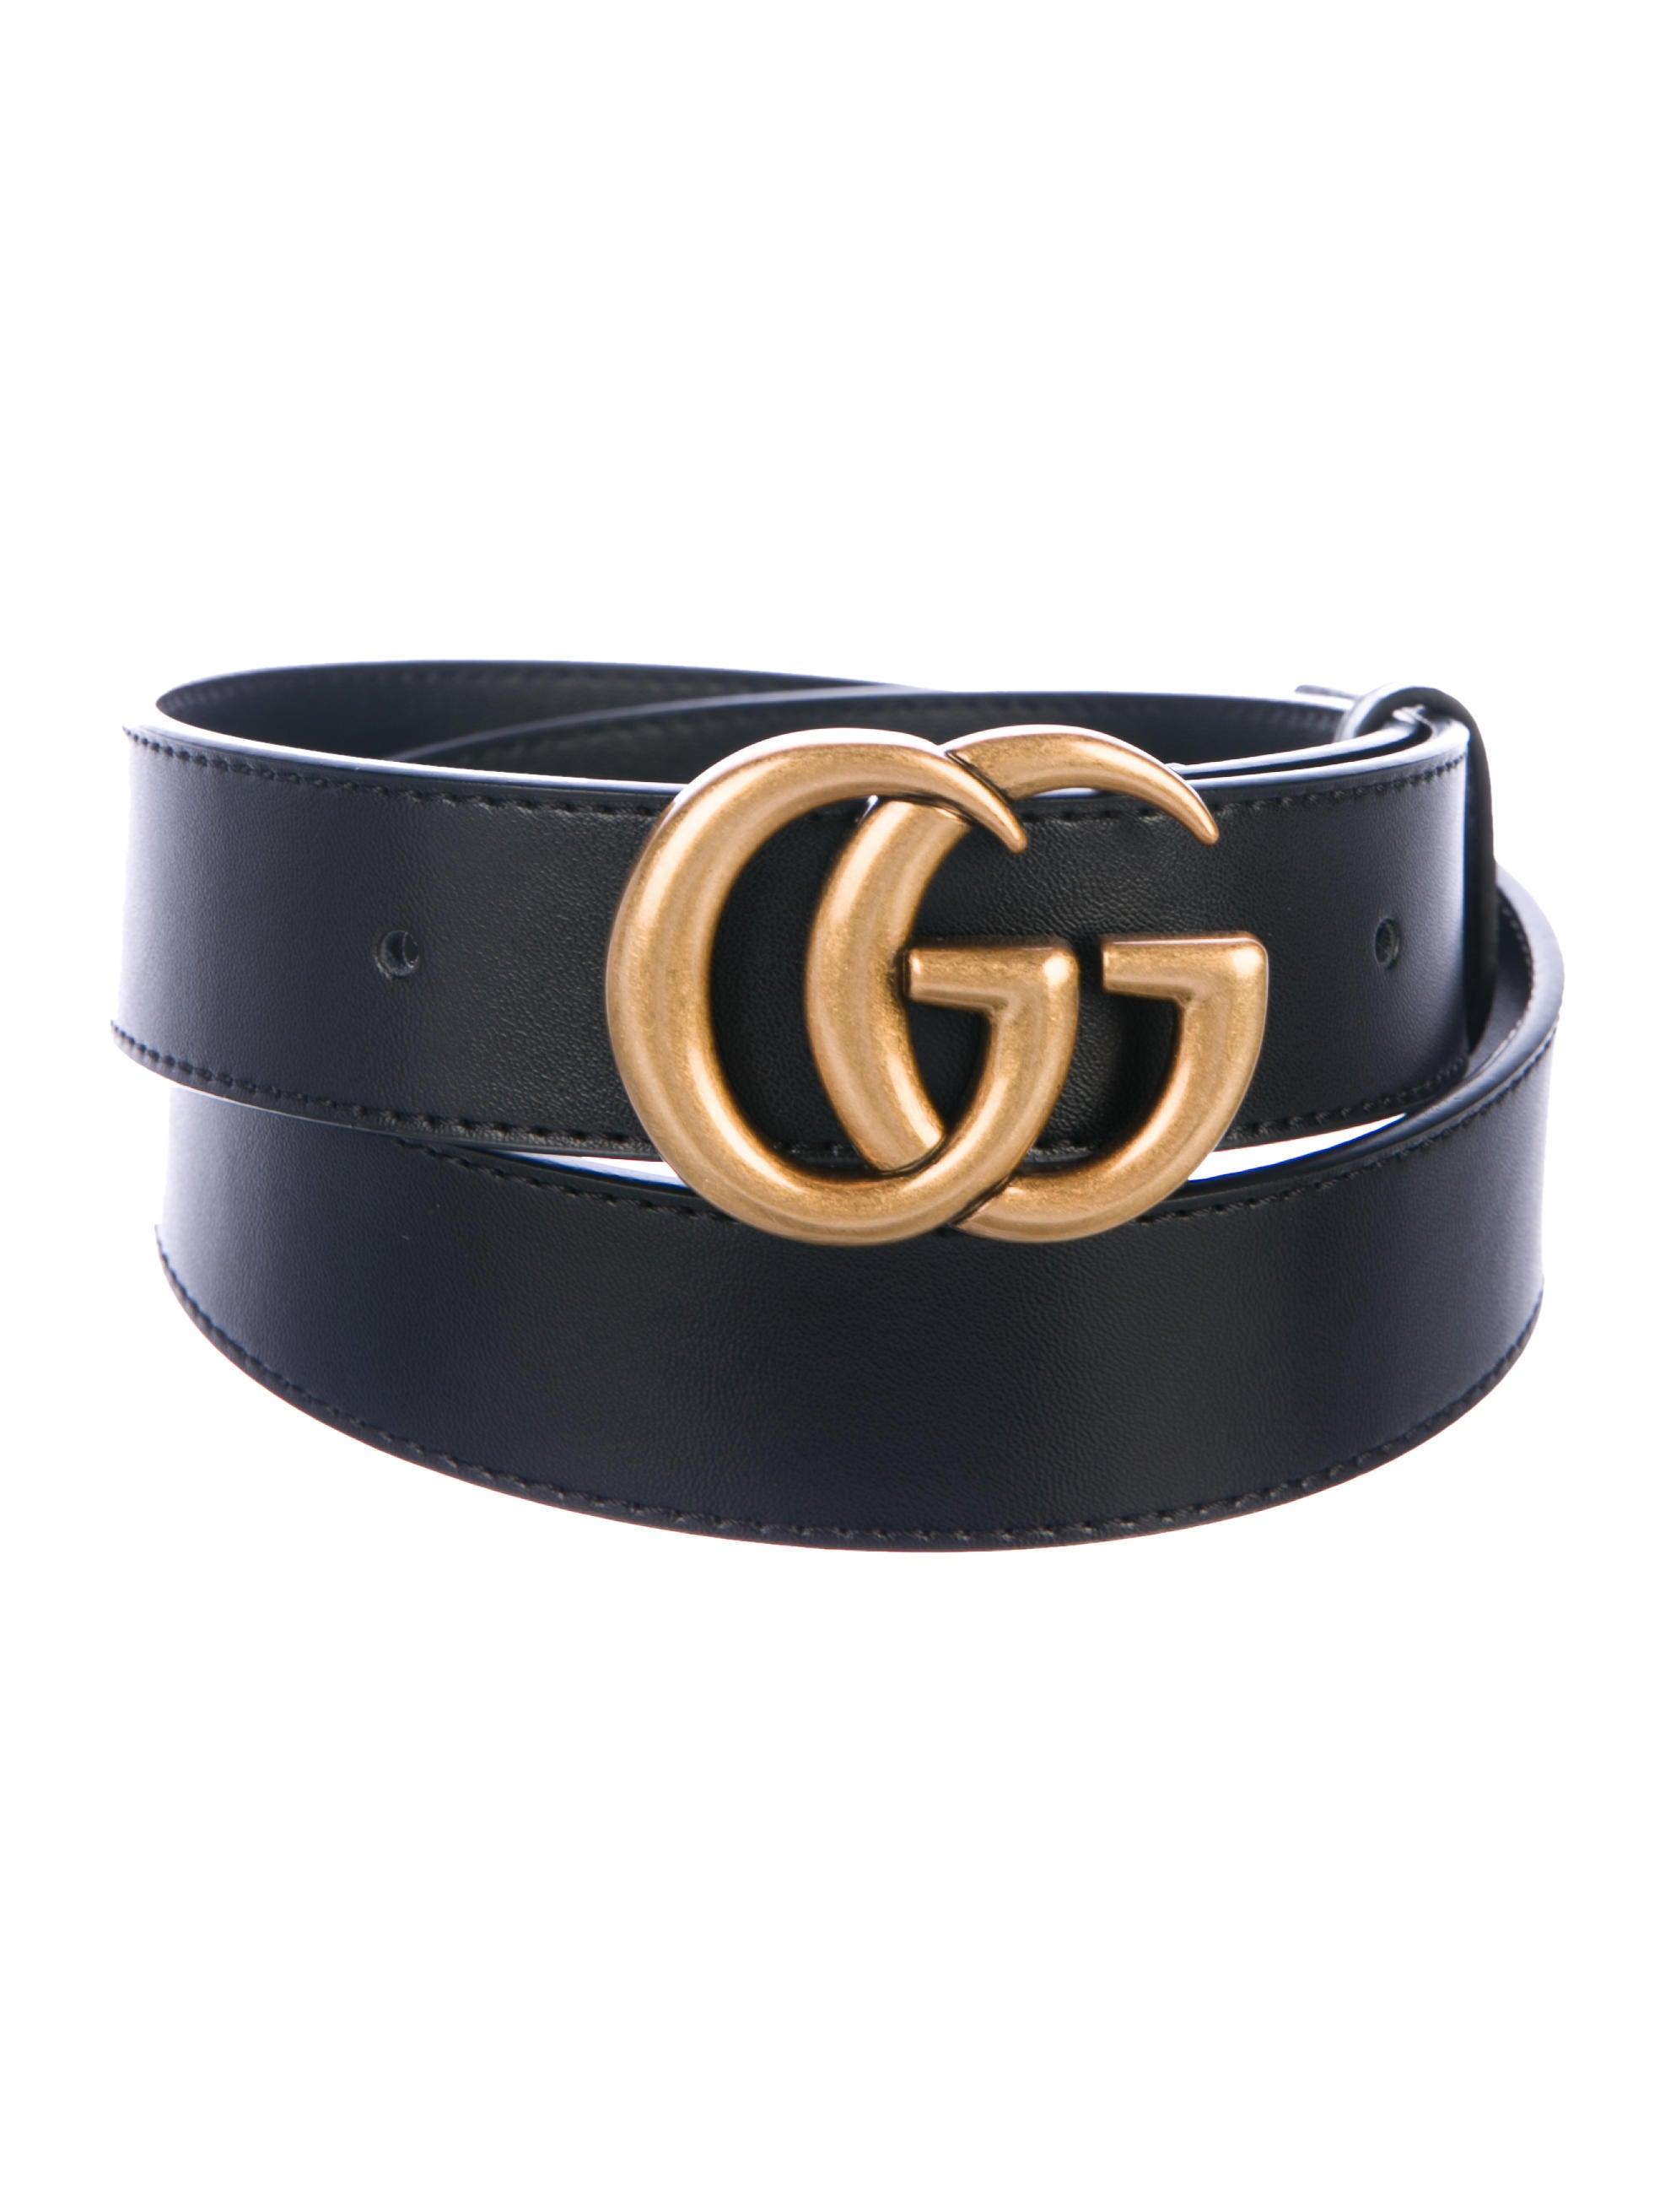 342eda40b68 Gucci GG Leather Belt - Accessories - GUC266198